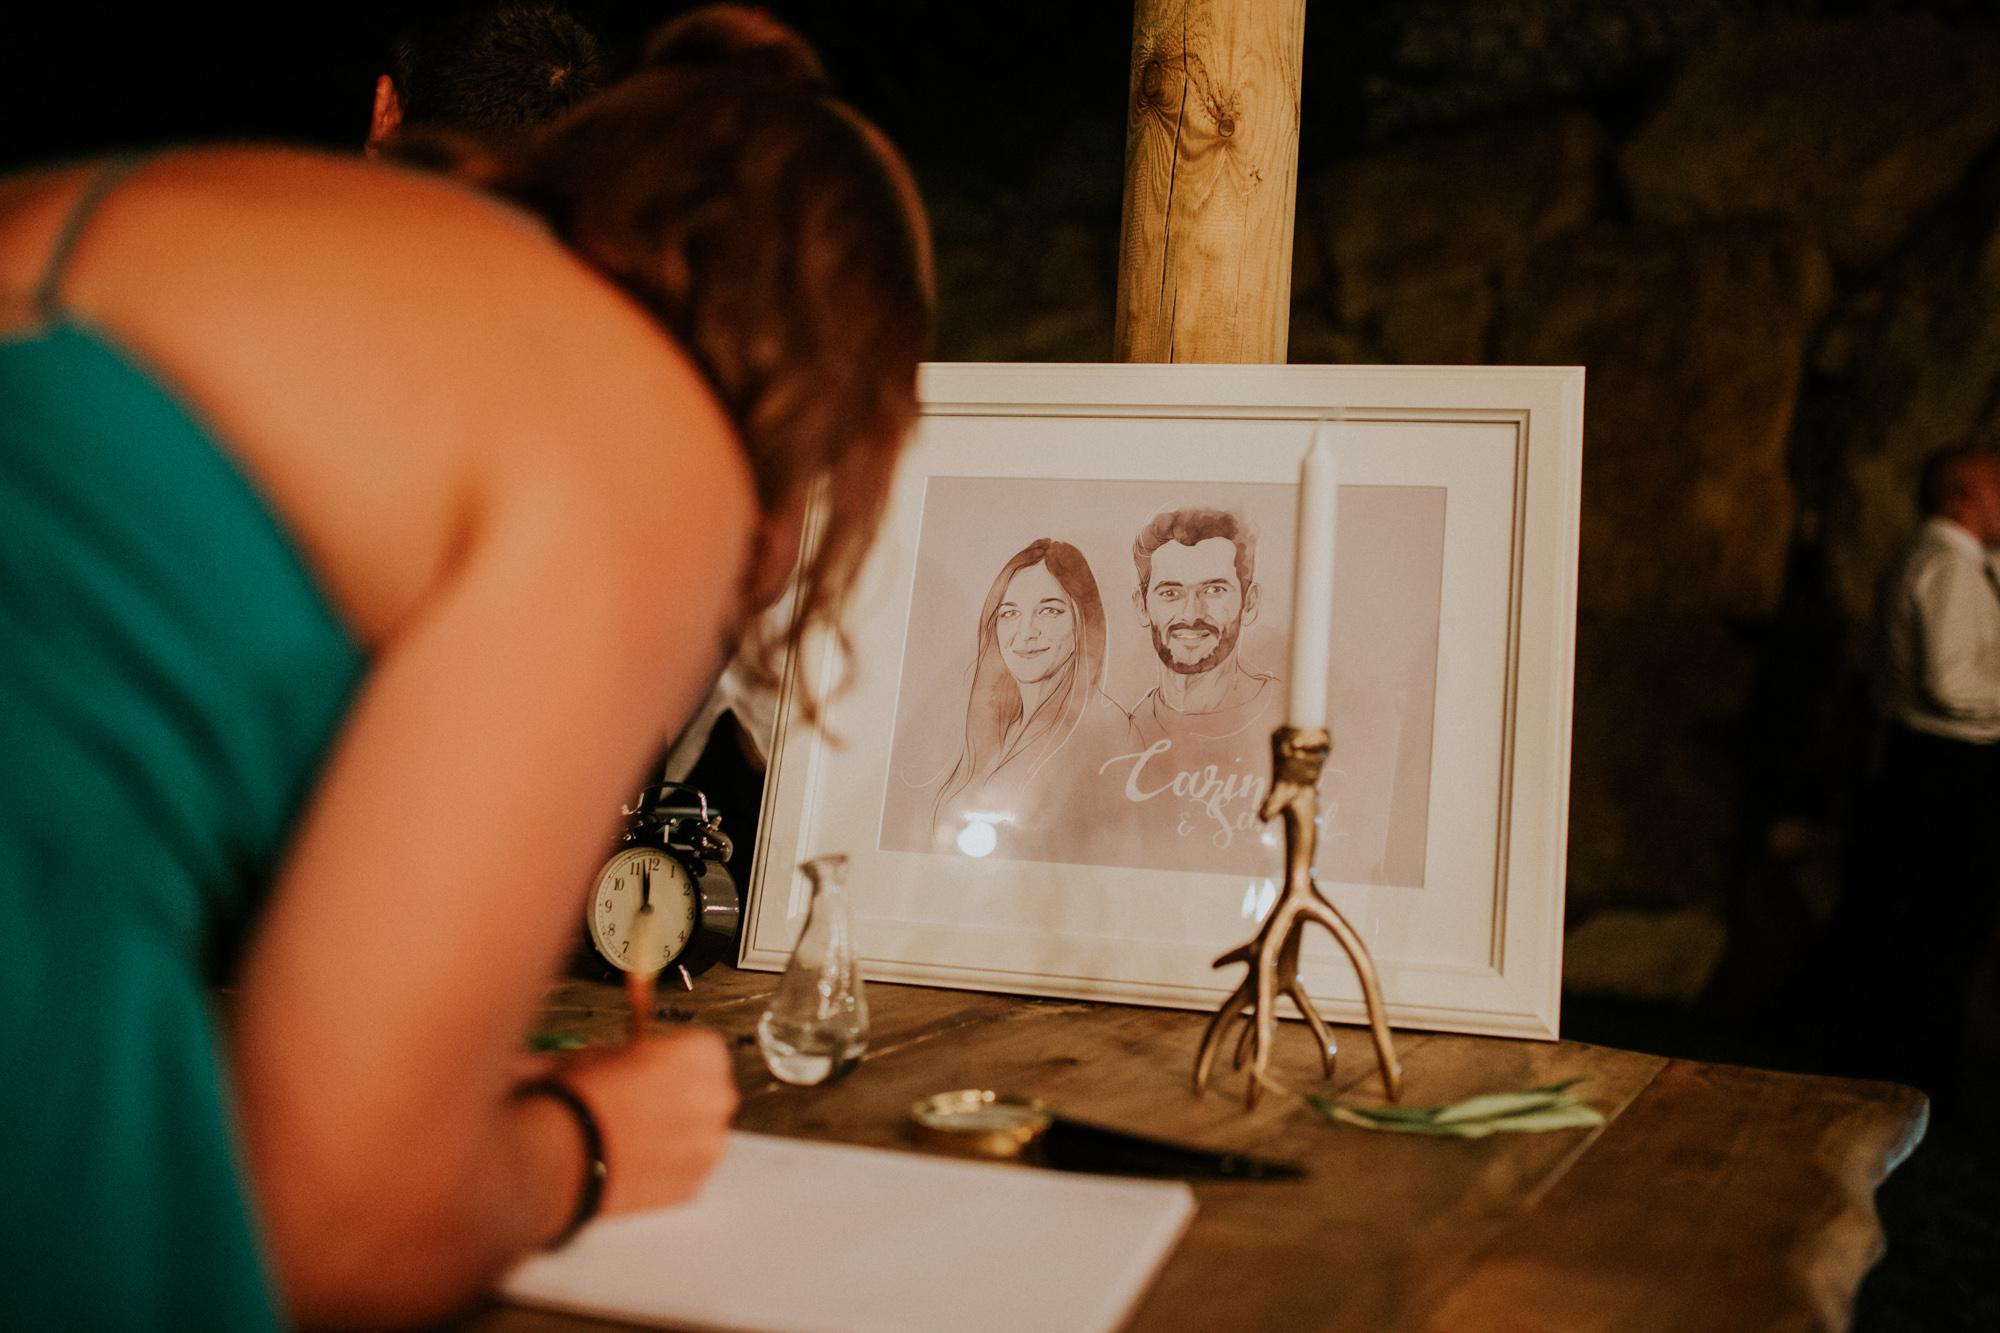 004-carina-e-samuel-wedding-casamento-quinta-dos-rouxinois-rustico-my-fancy-wedding-mafra-malveira-lisboa-sintra-cascais-filipe-santiago-fotografia-fotografo-lifestyle-destination-portugal